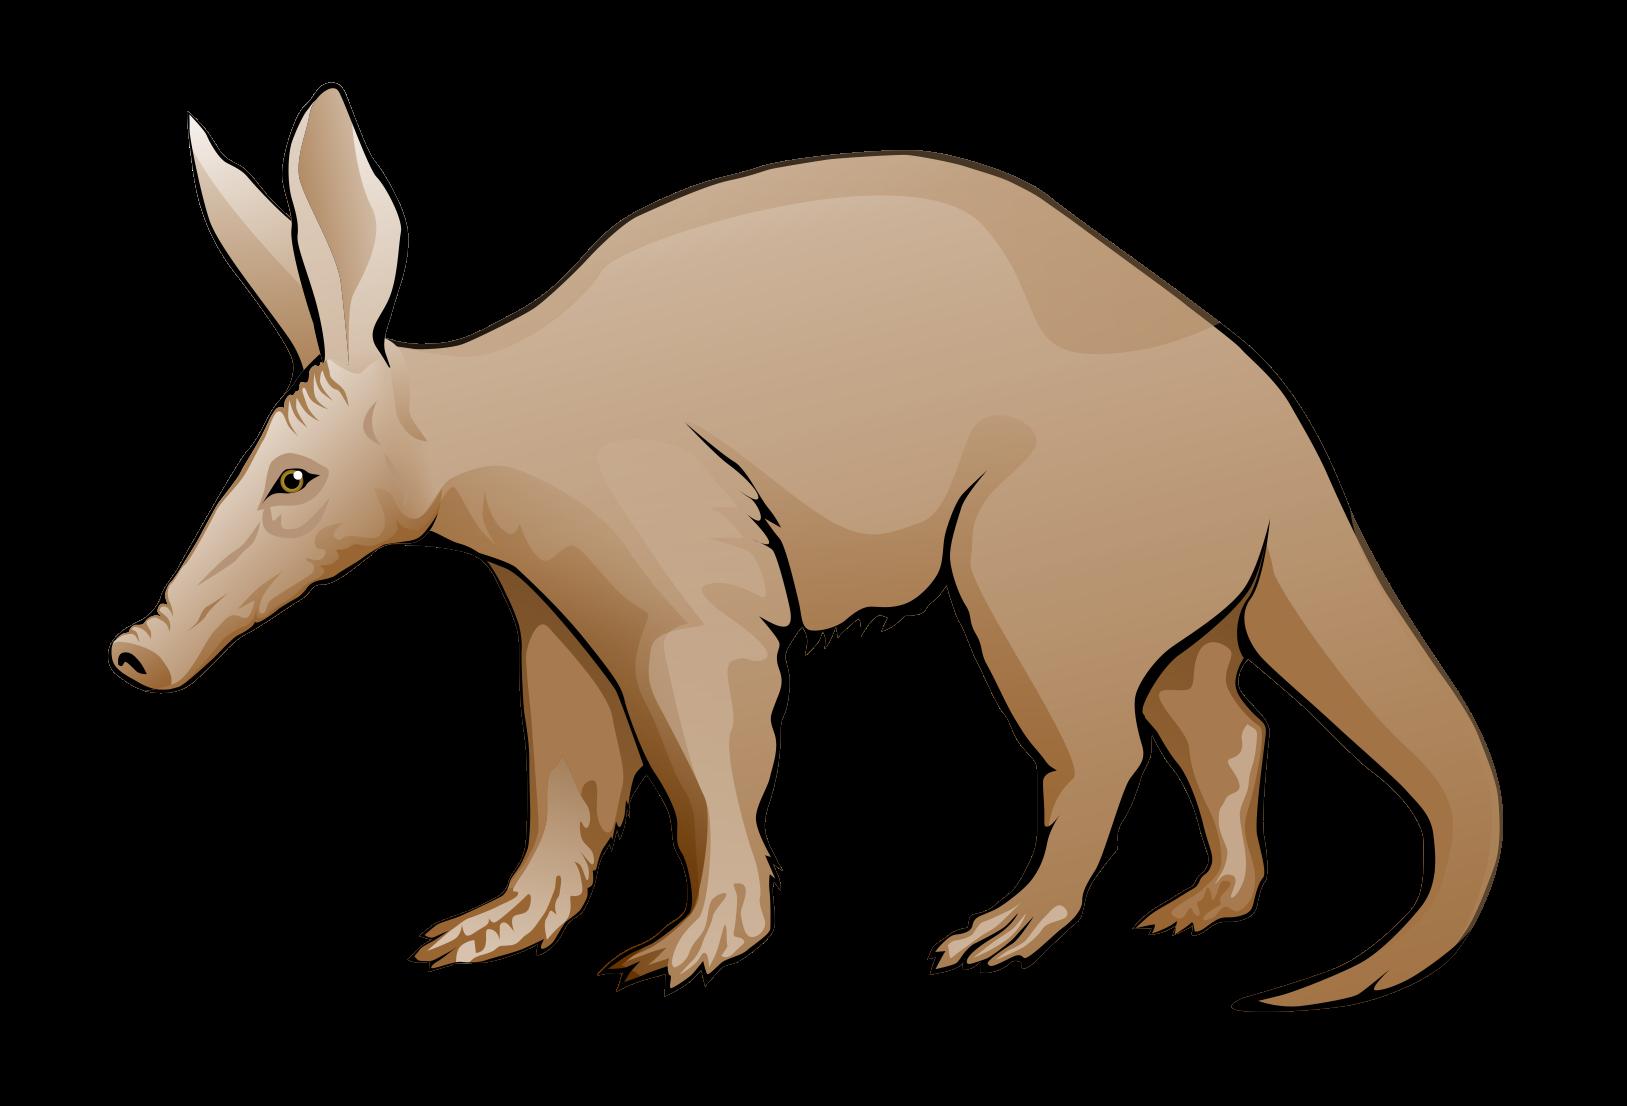 Image Of Aardvark Clipart .-Image of Aardvark Clipart .-19